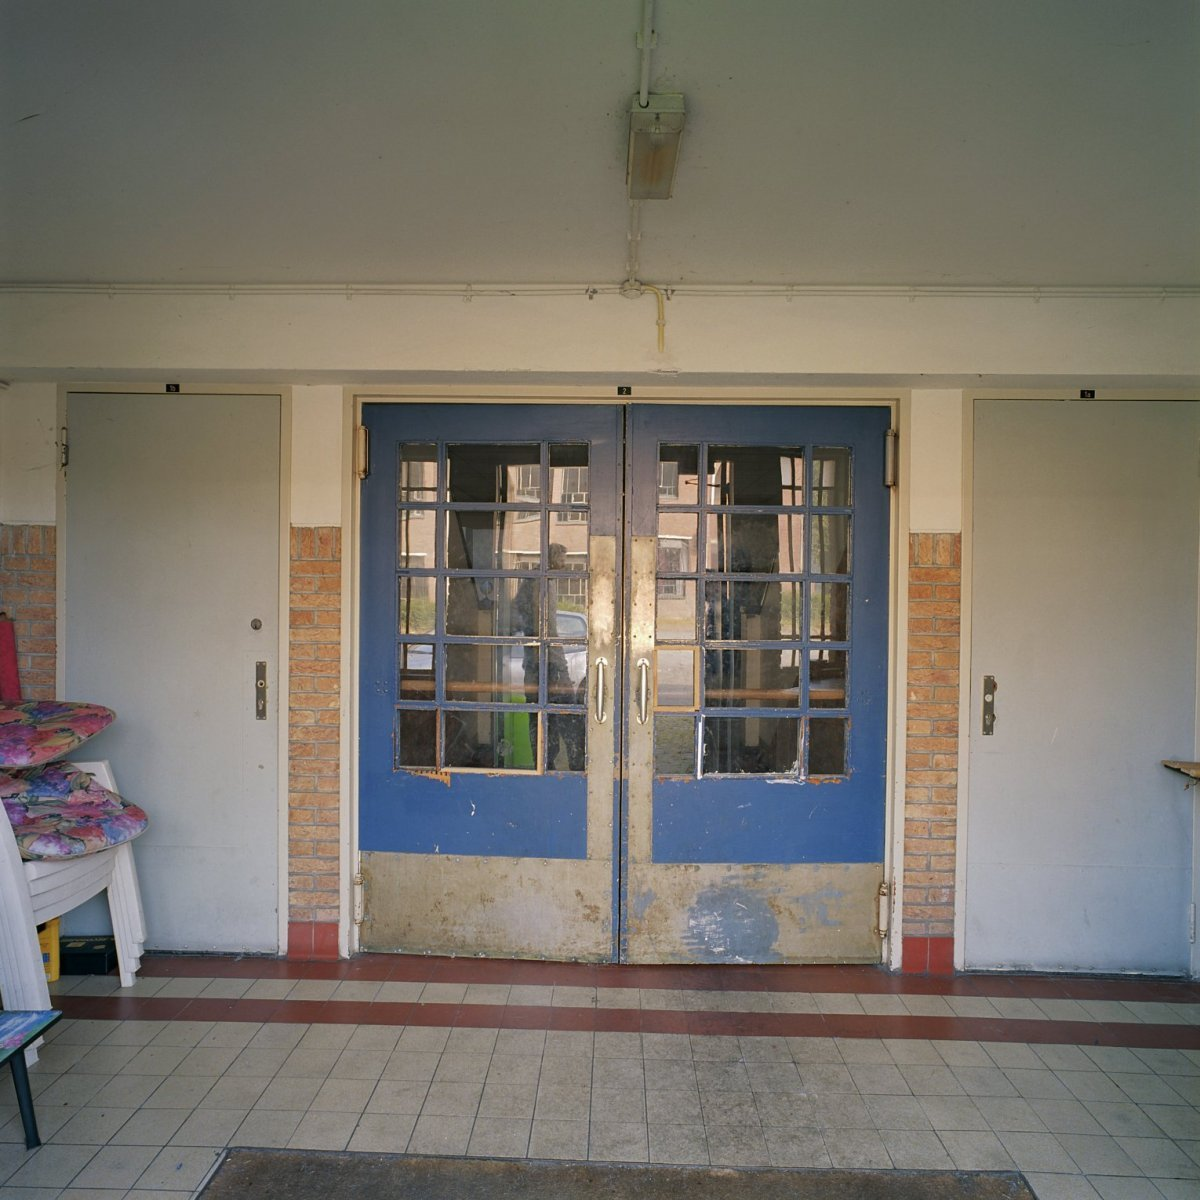 File interieur 1e gebouw rechts klapdeuren eindhoven for Interieur eindhoven